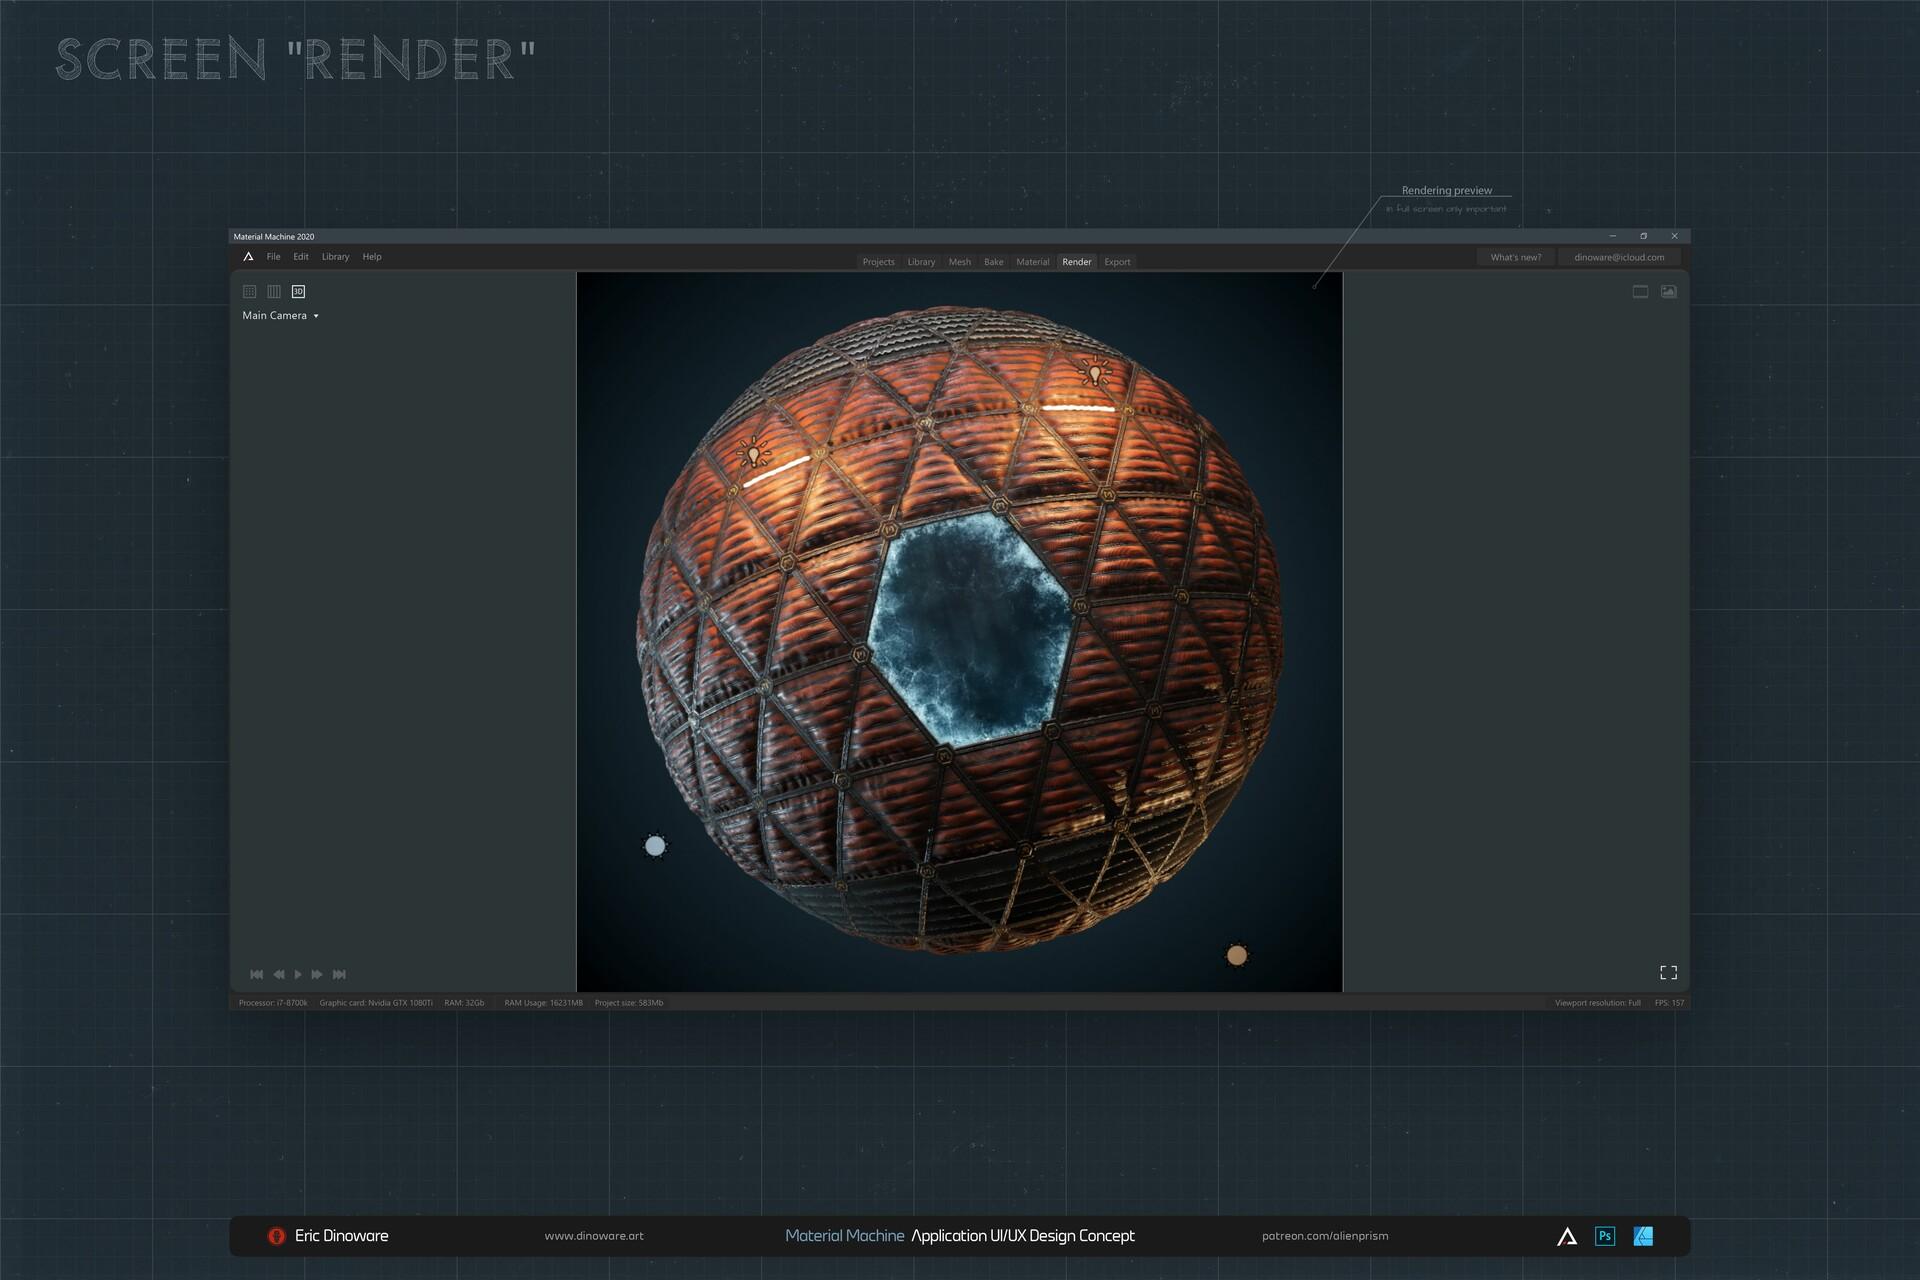 Screen: Render